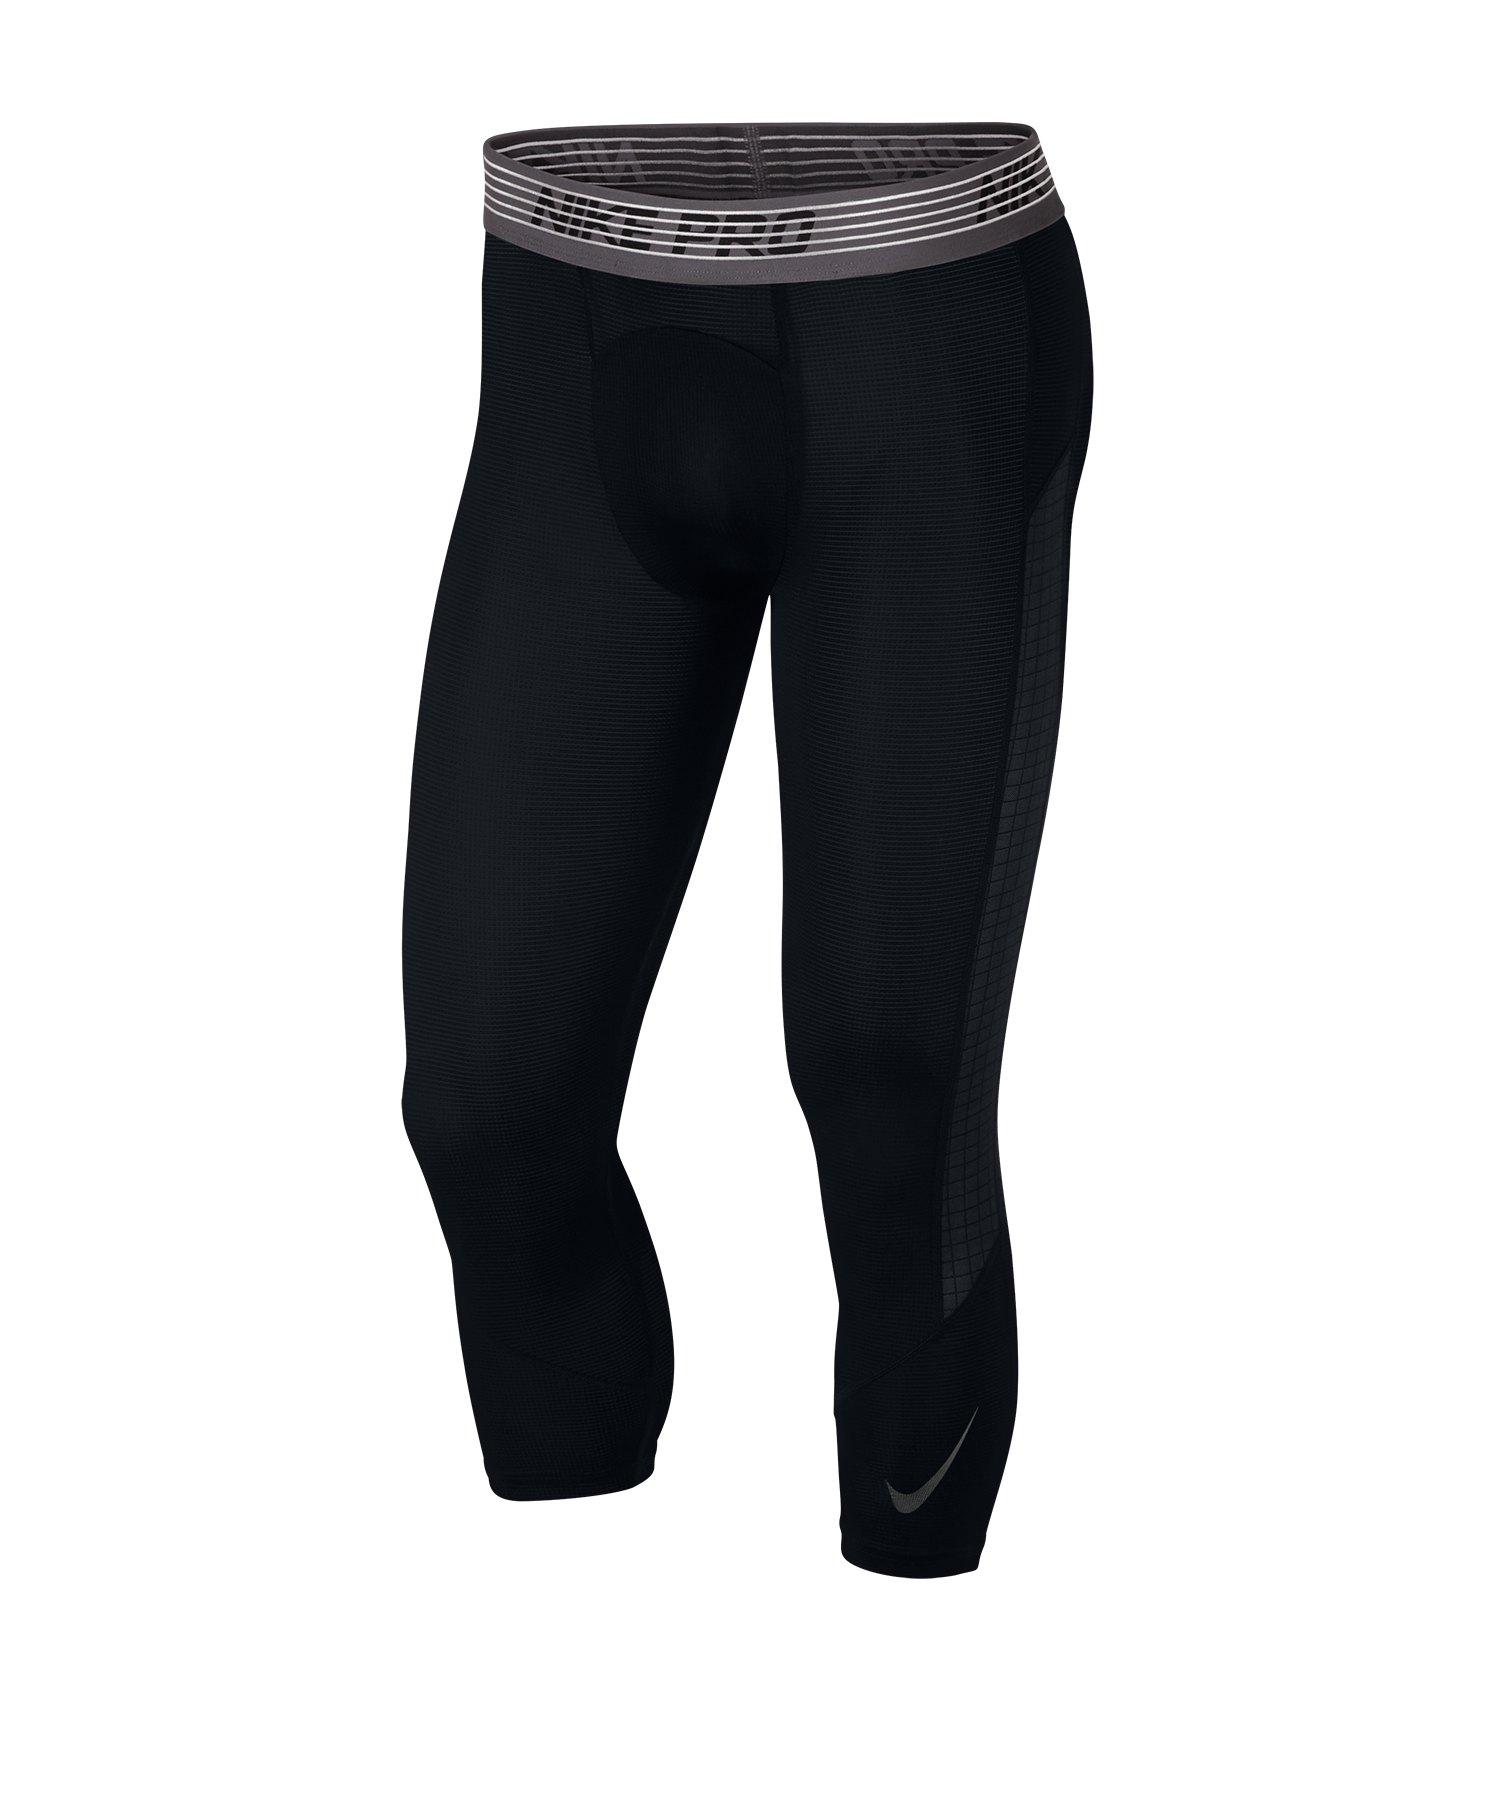 Nike Pro 3/4 Tights Schwarz F010 - schwarz